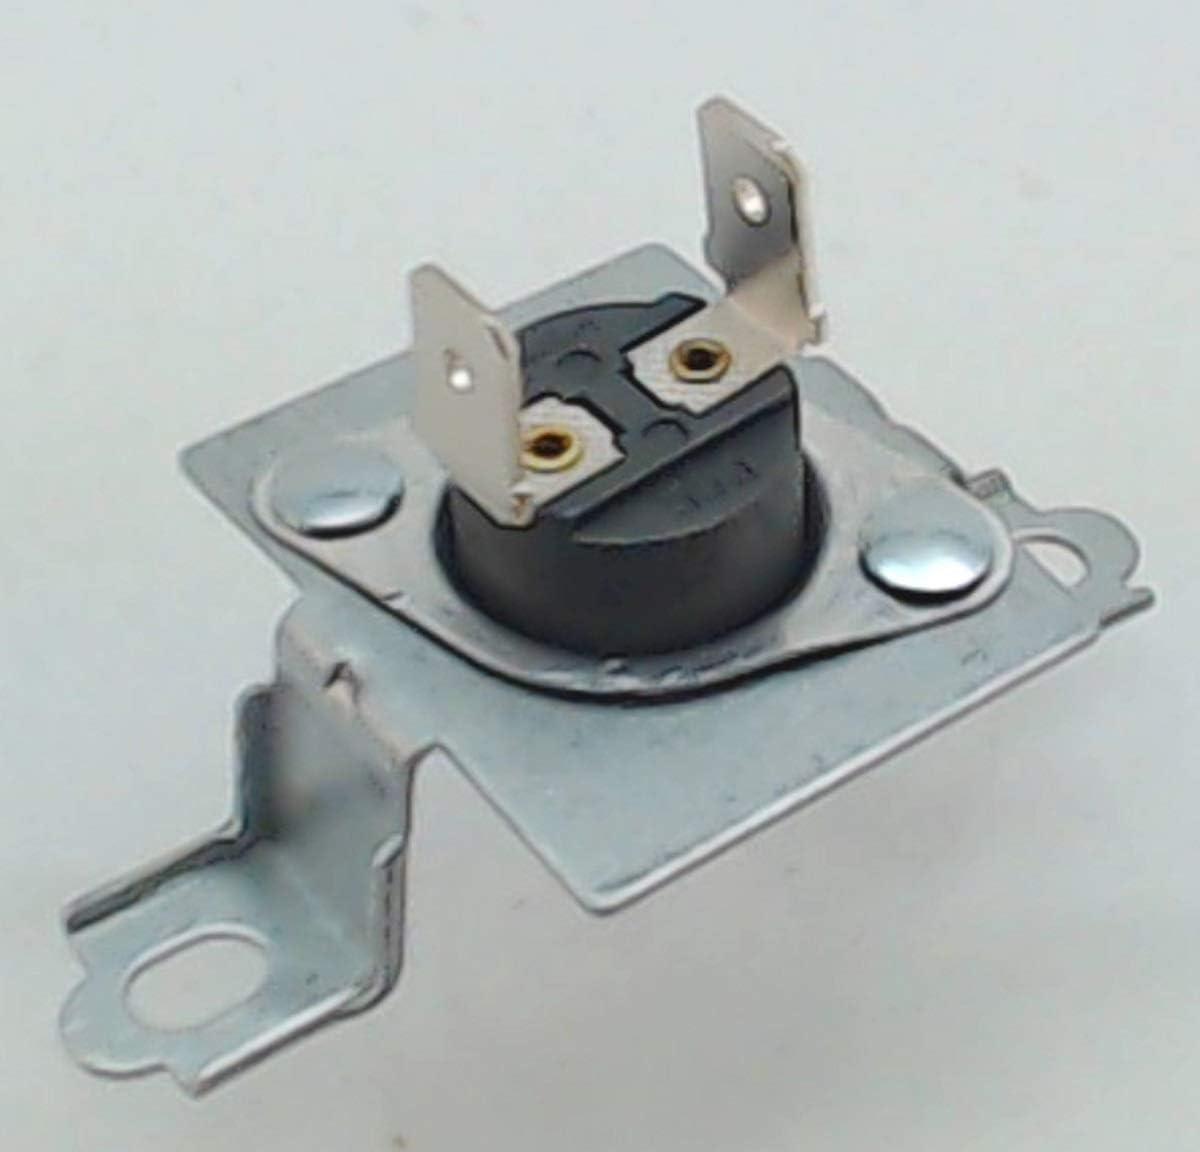 Re-settable 6931EL3003C LG Dryer High Limit Thermostat